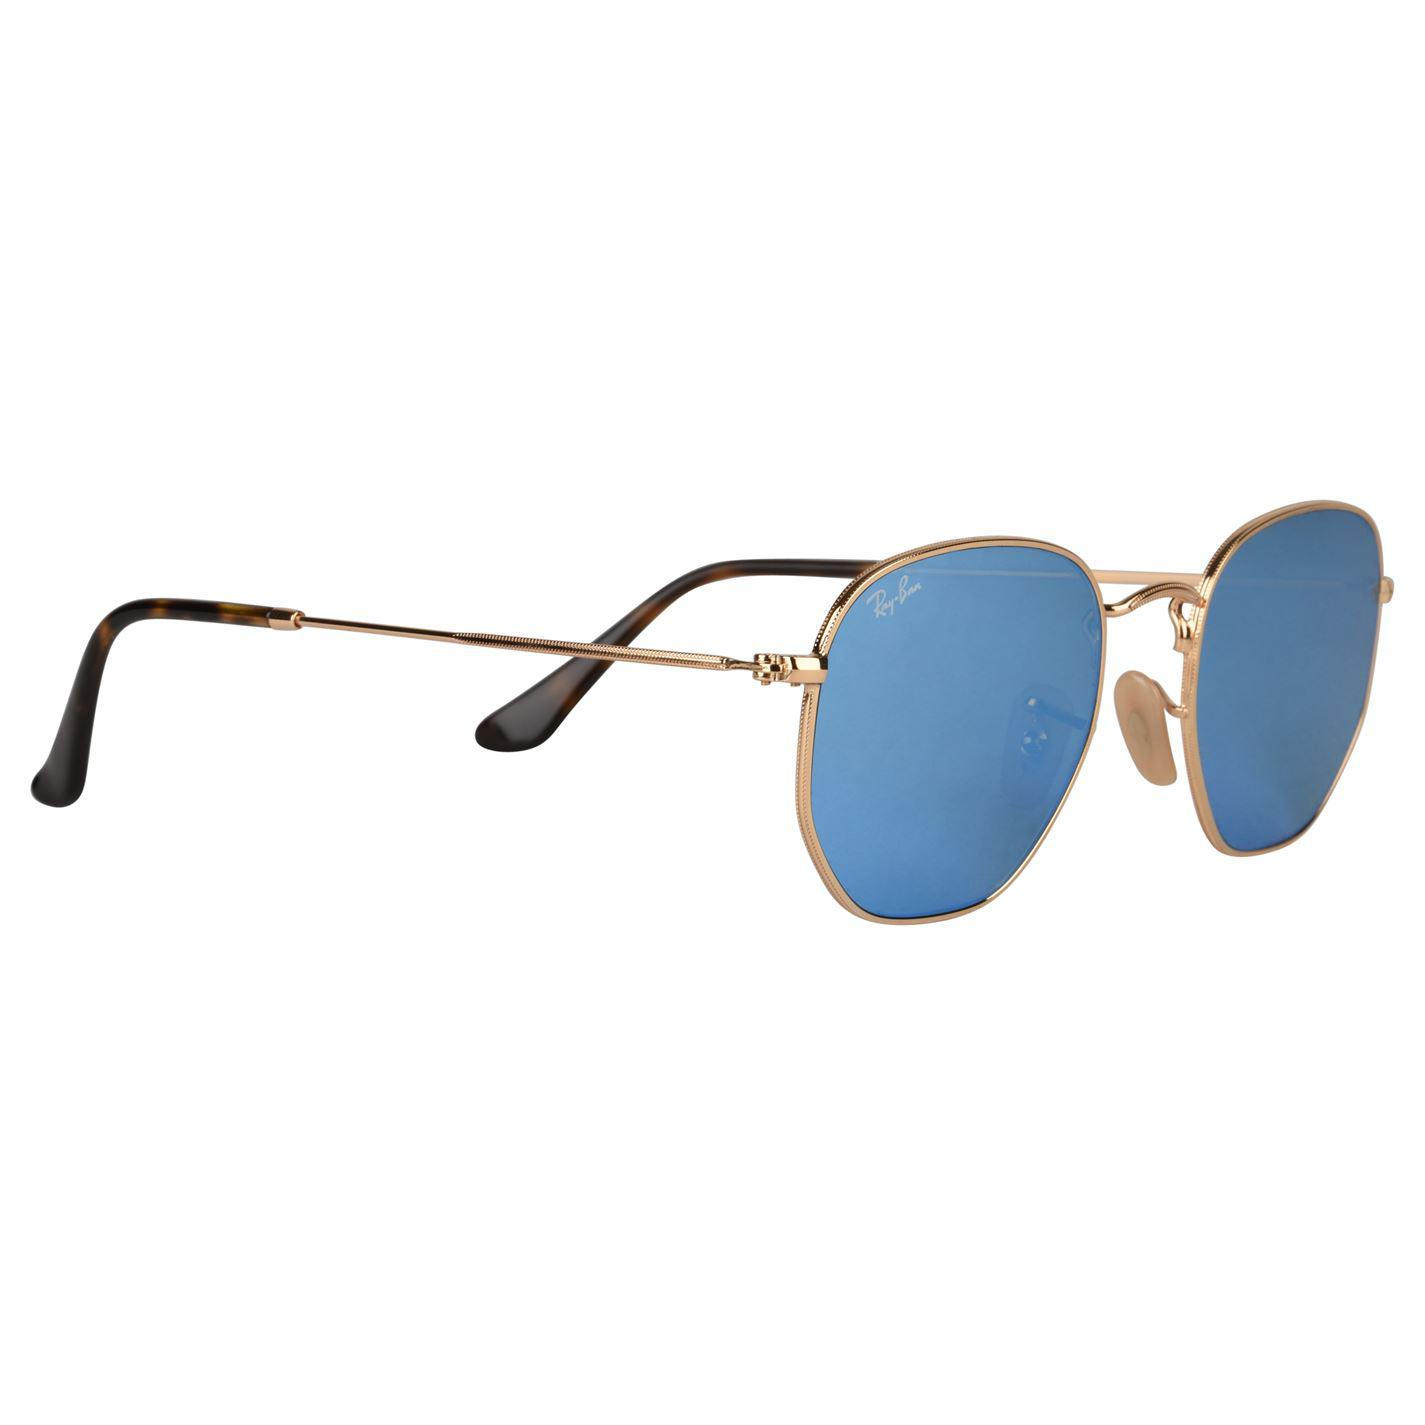 8d3c8d000b1 Ray-Ban - Blue Hexagonal Flat Lens Sunglasses for Men - Lyst. View  fullscreen